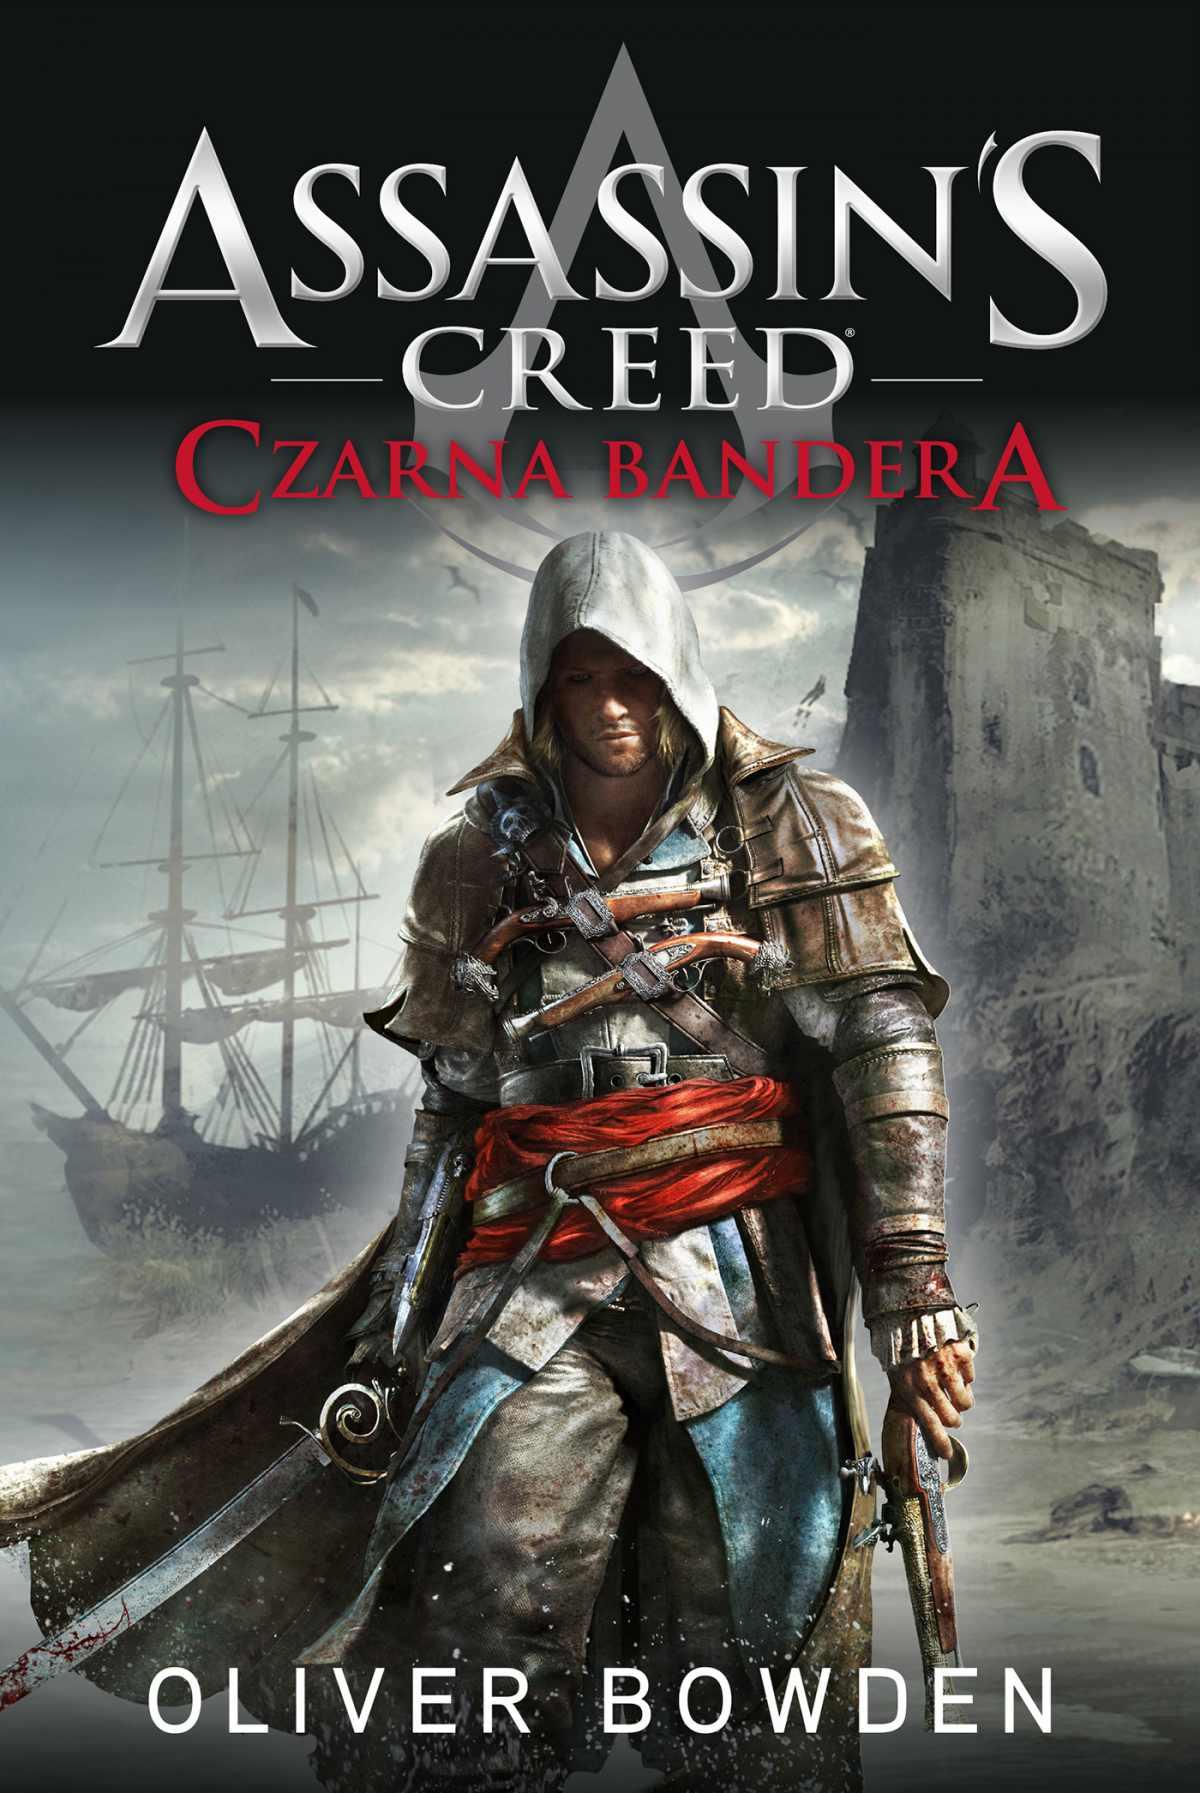 Assassin's Creed: Czarna bandera - Ebook (Książka EPUB) do pobrania w formacie EPUB